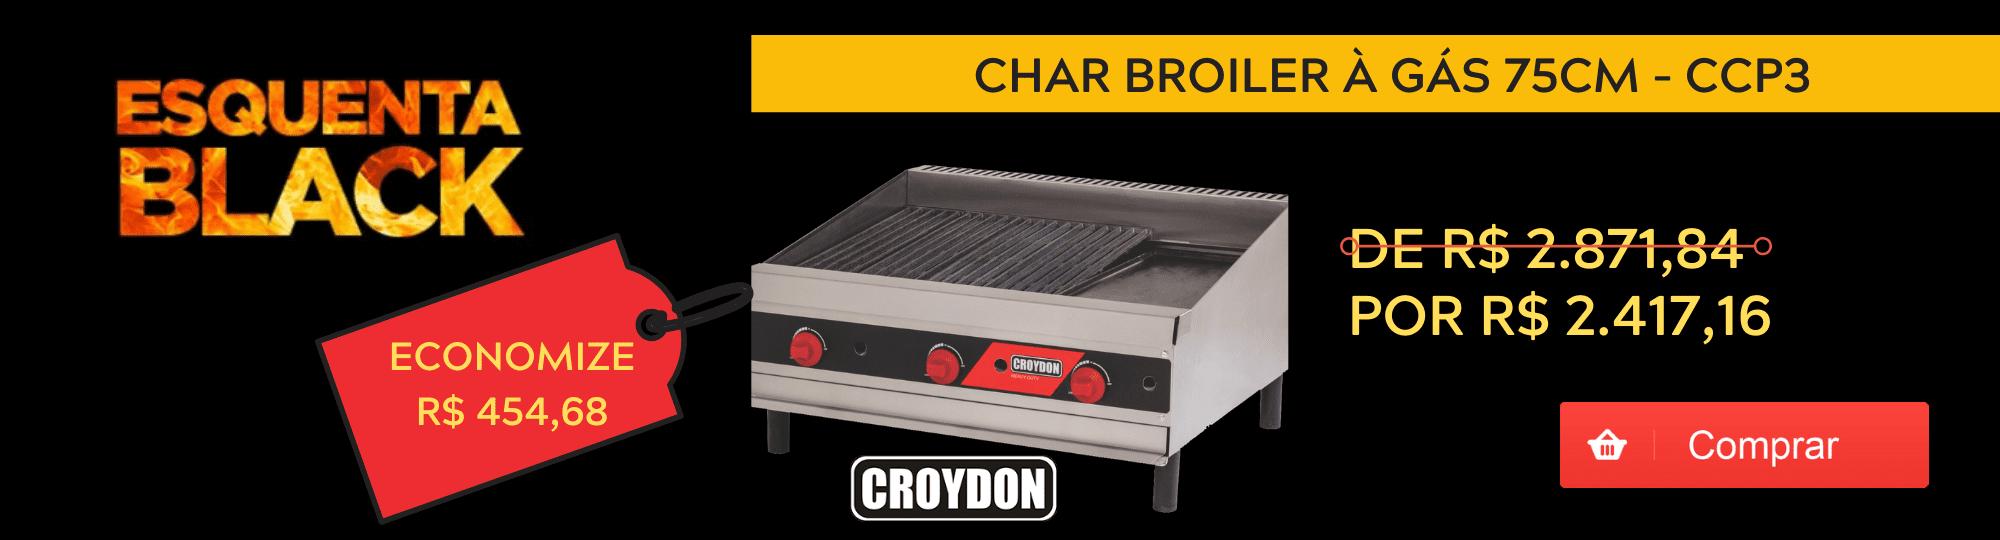 Char Broiler a Gas 75cm Croydon